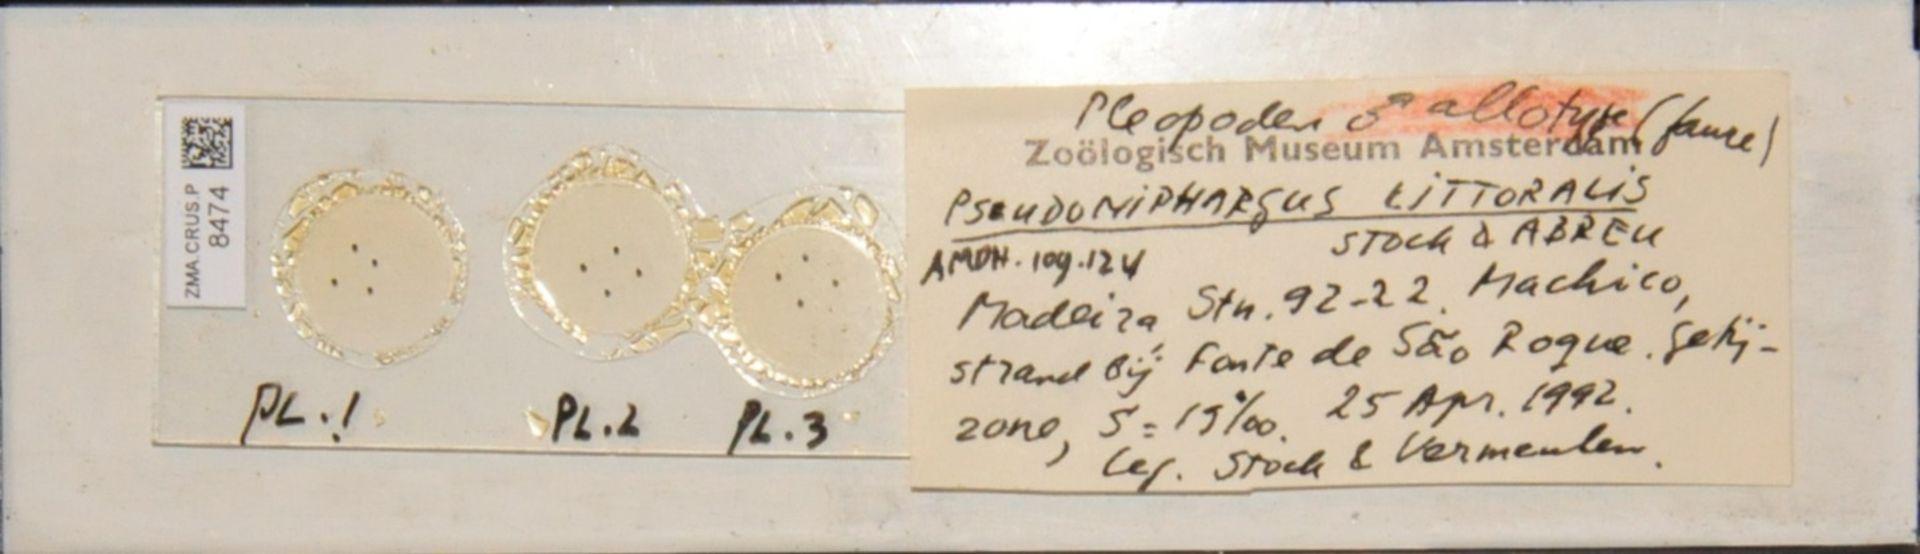 ZMA.CRUS.P.8474 | Pseudoniphargus cf. littoralis Stock & Abreu